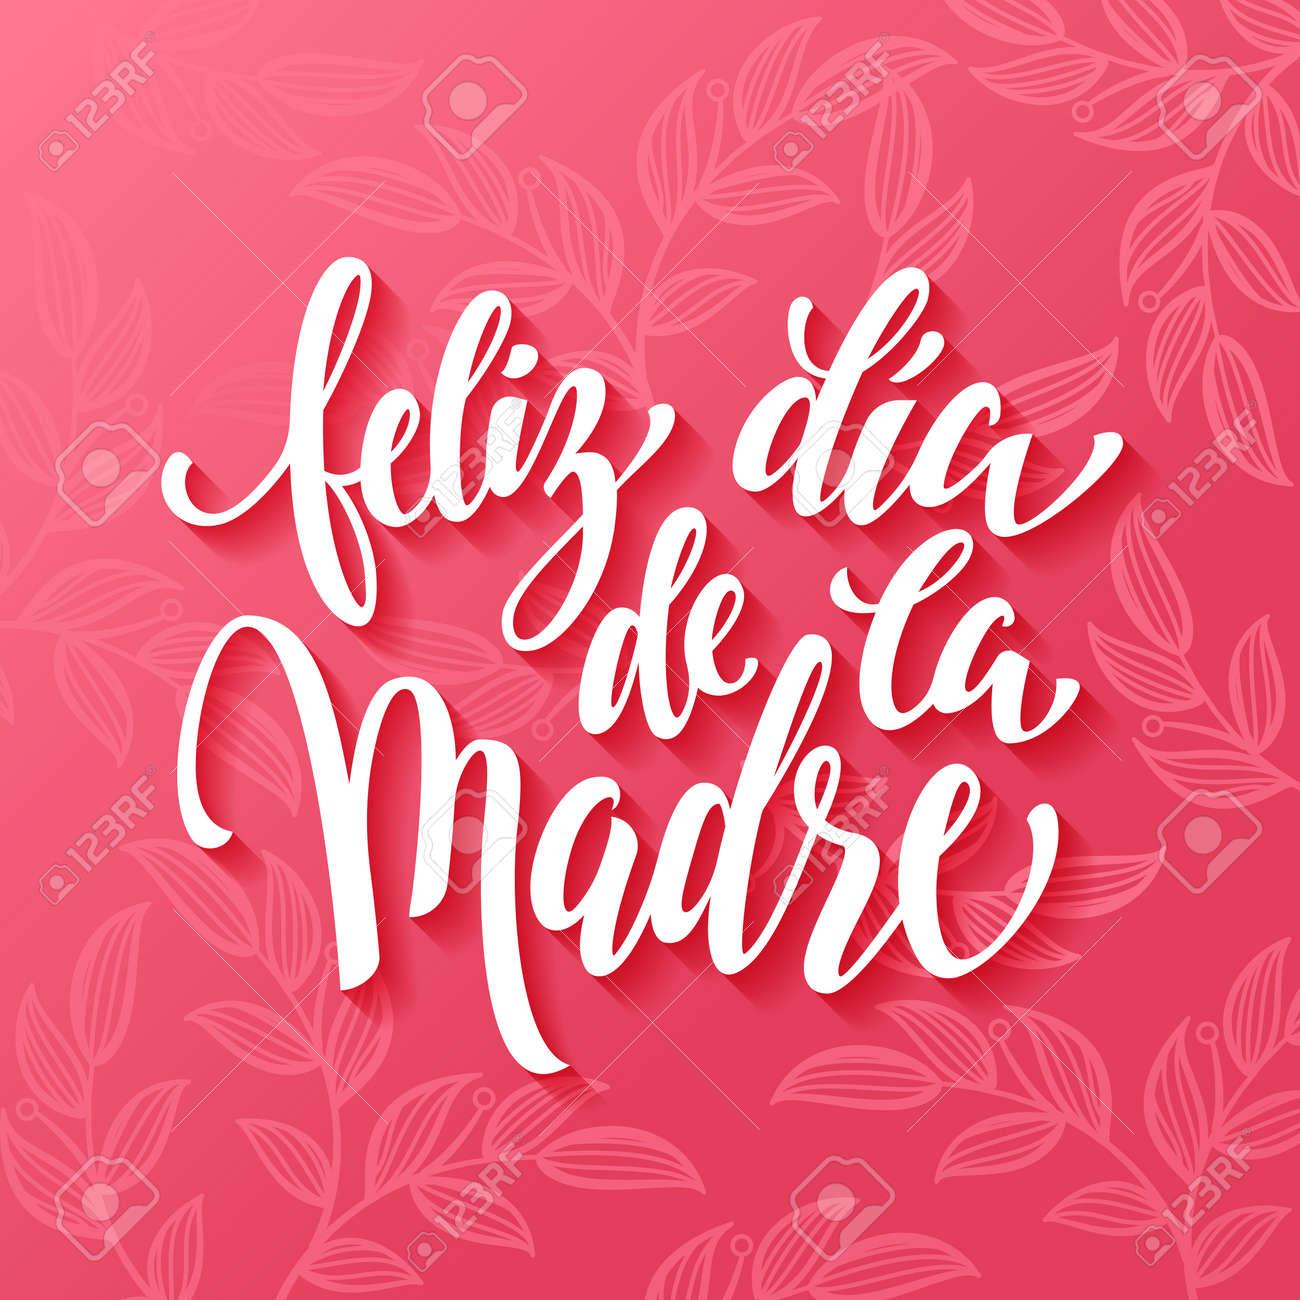 Feliz Dia De La Madre Mothers Day Greeting Card Pink Red Floral Pattern Background